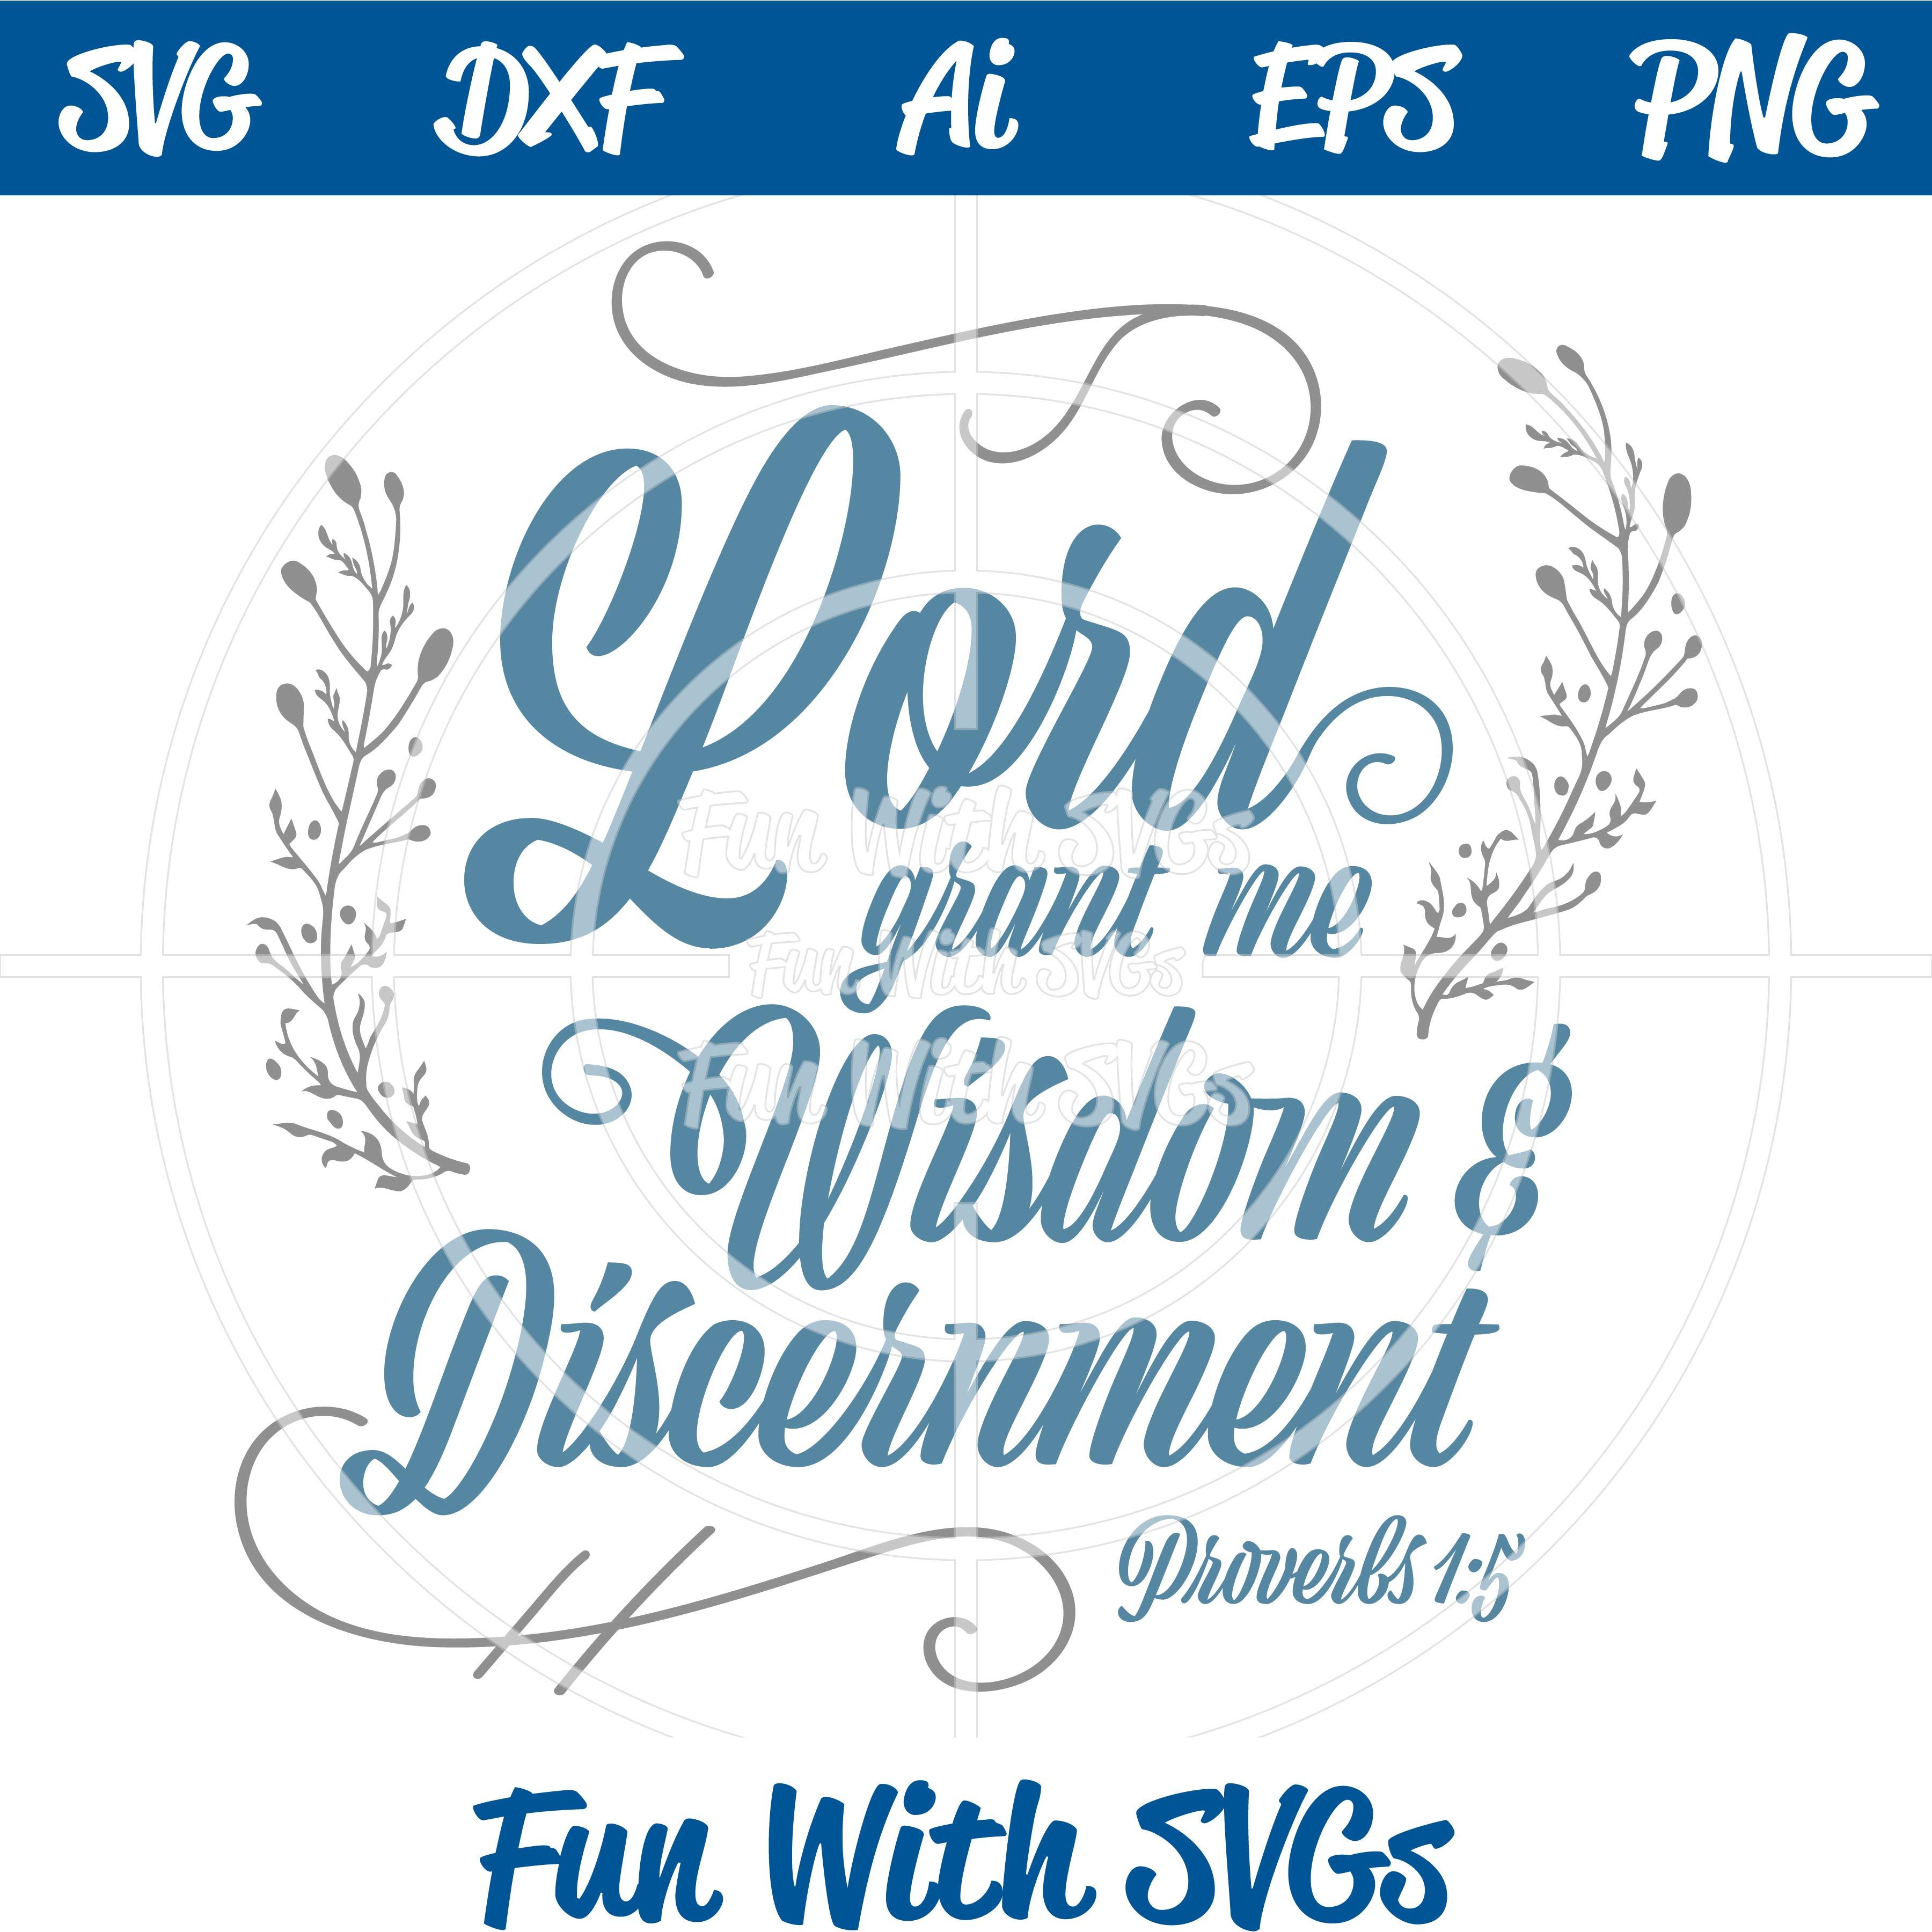 Lord Grant me Wisdom Proverbs 1:5 SVG Cut File